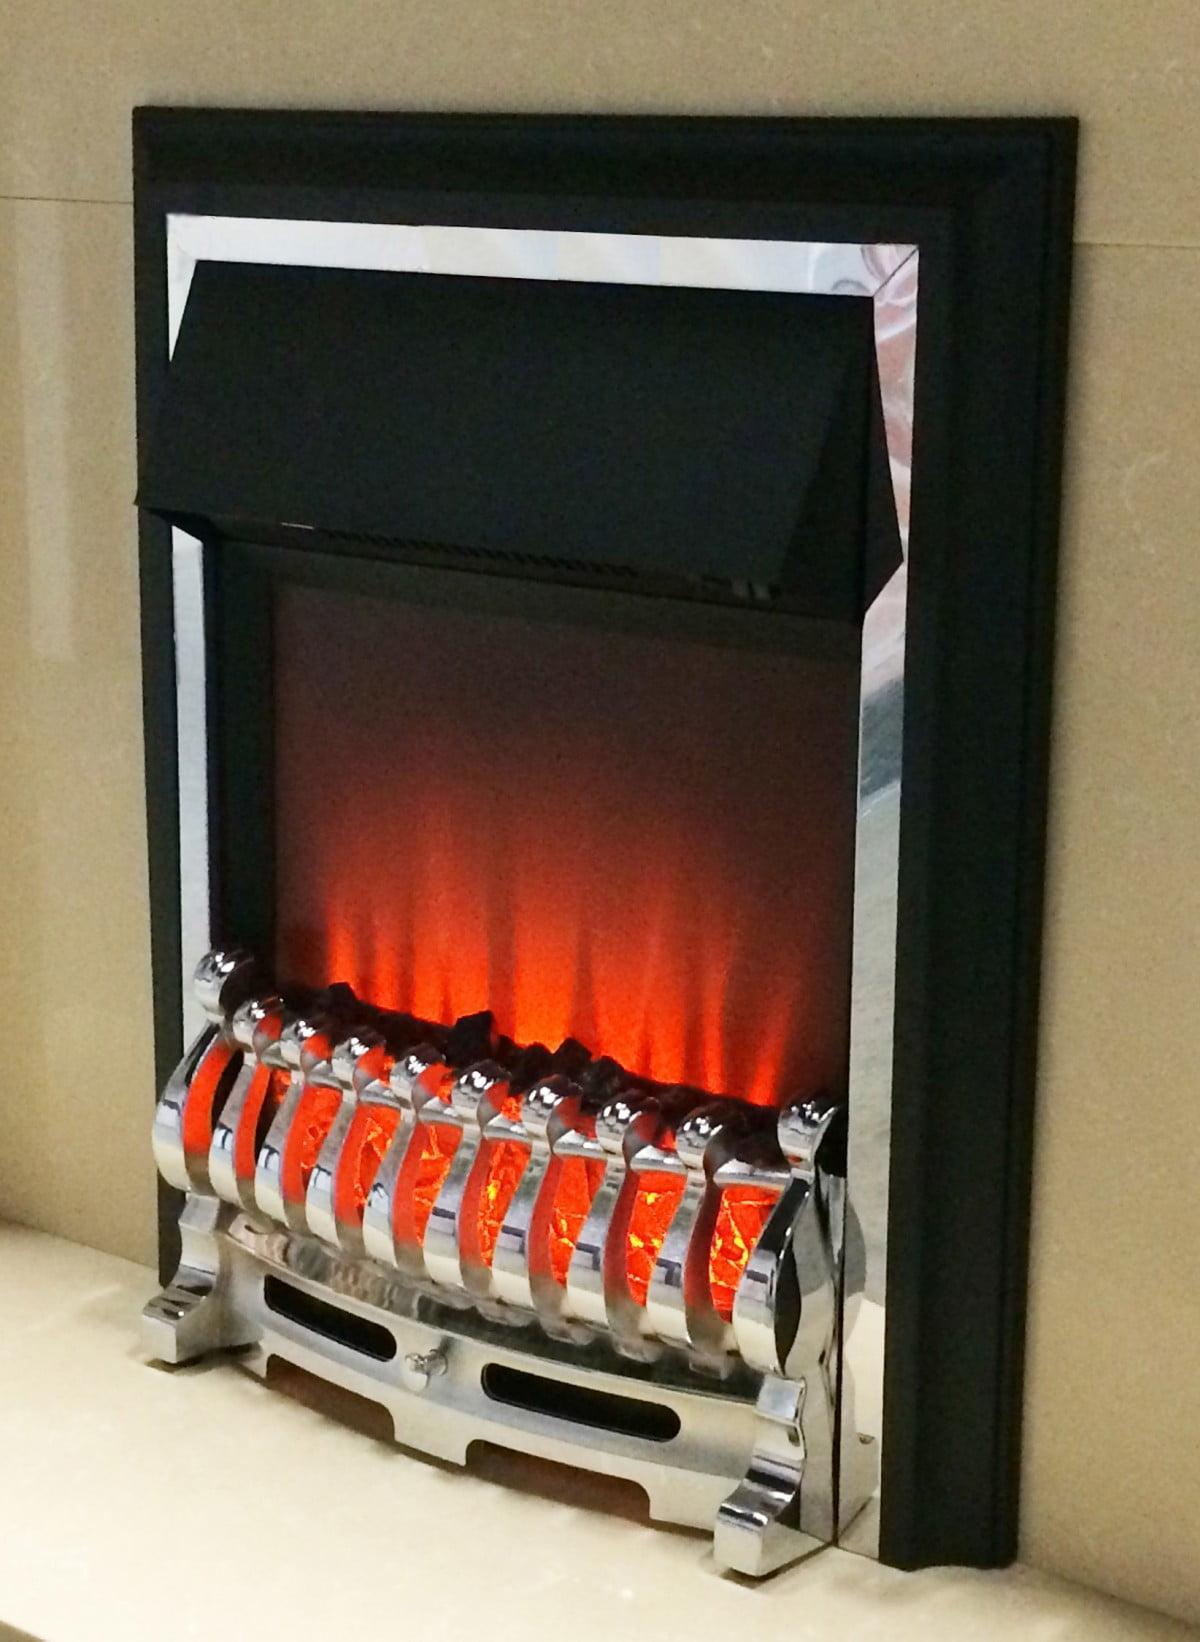 gr8 fires stove u0026 fireplace blog advice news u0026 competitions